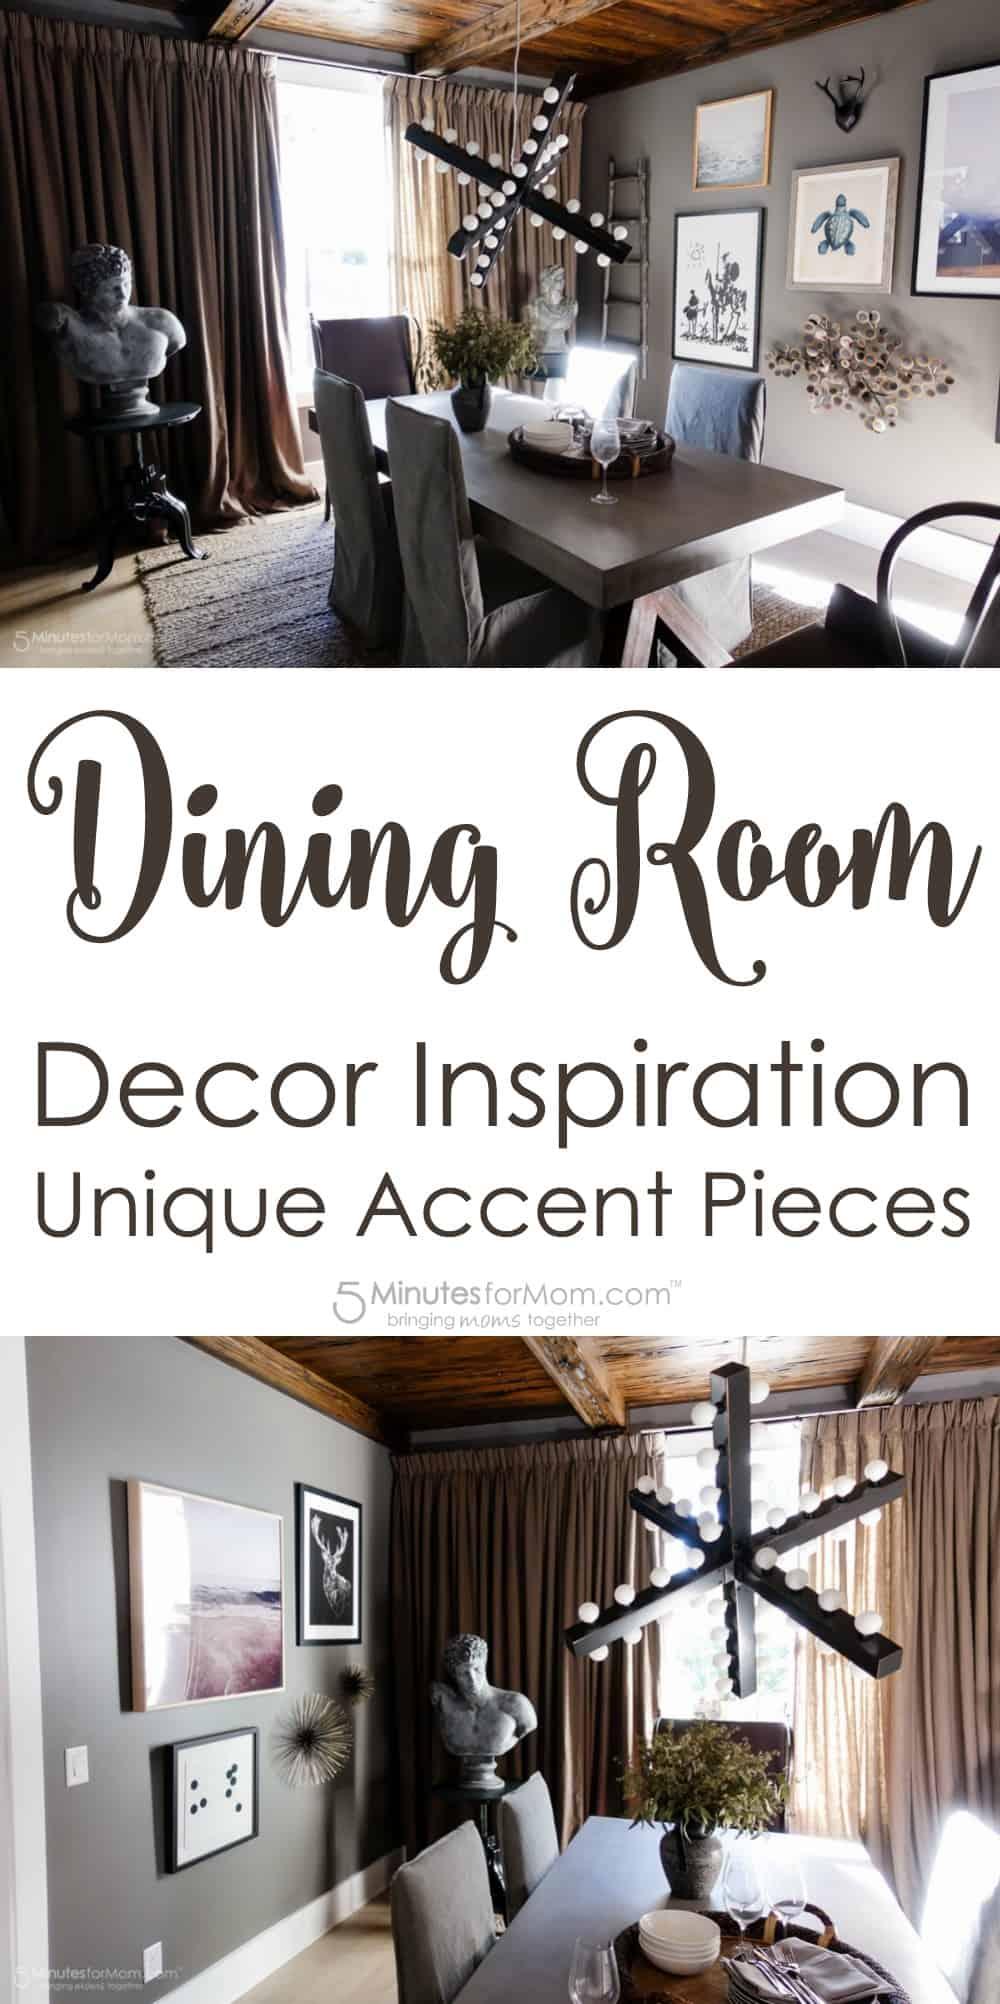 Dining Room Decor Inspiration - Unique Accent Pieces